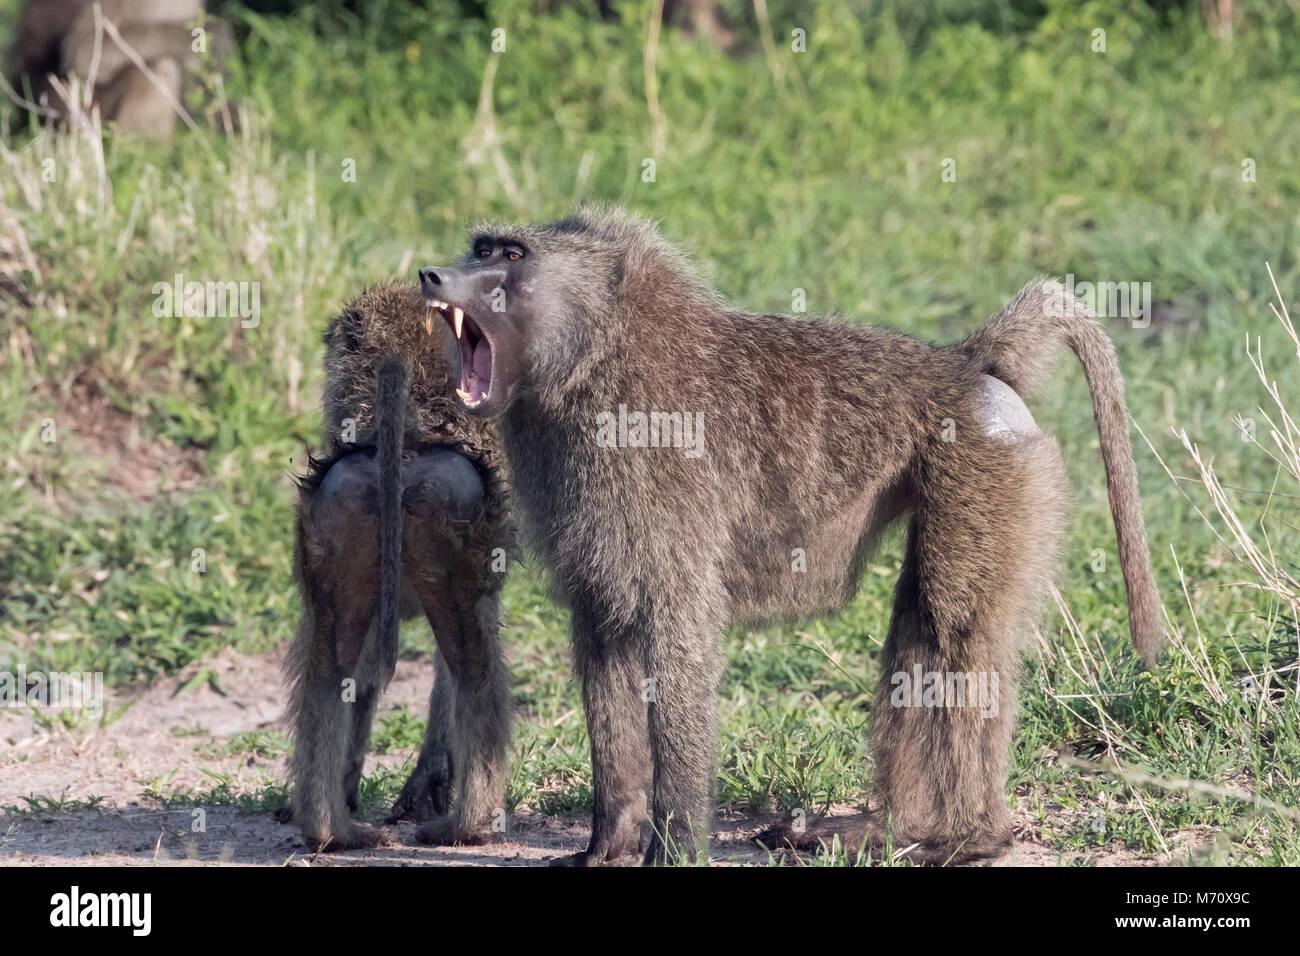 Toothy grin, olive baboon (Papio anubis) at Gumeti Game Reserve, Serengeti, Tanzania - Stock Image